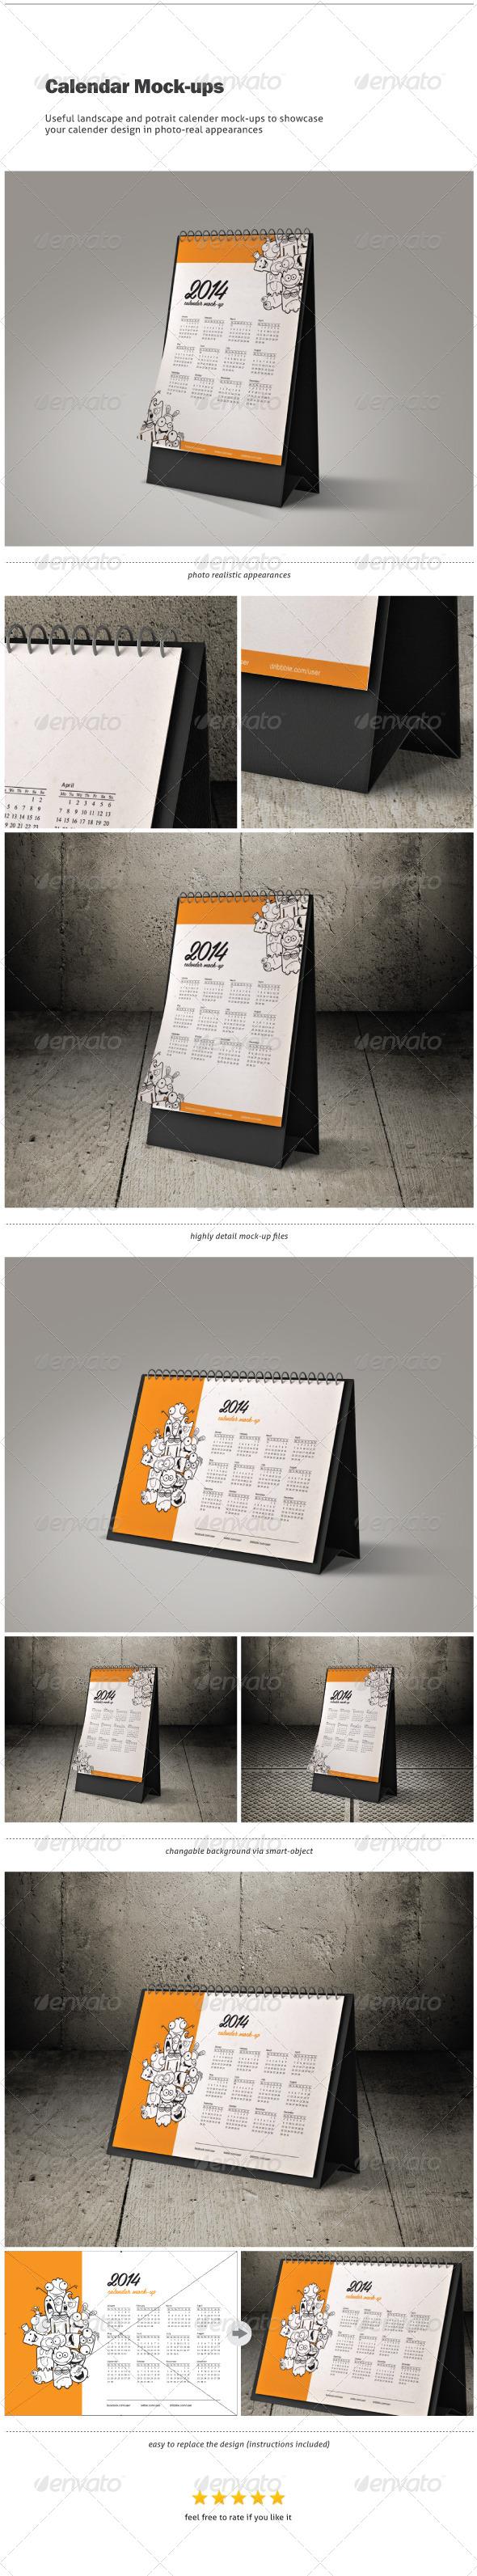 Calendar Mock-ups / Landscape and Portrait - Print Product Mock-Ups